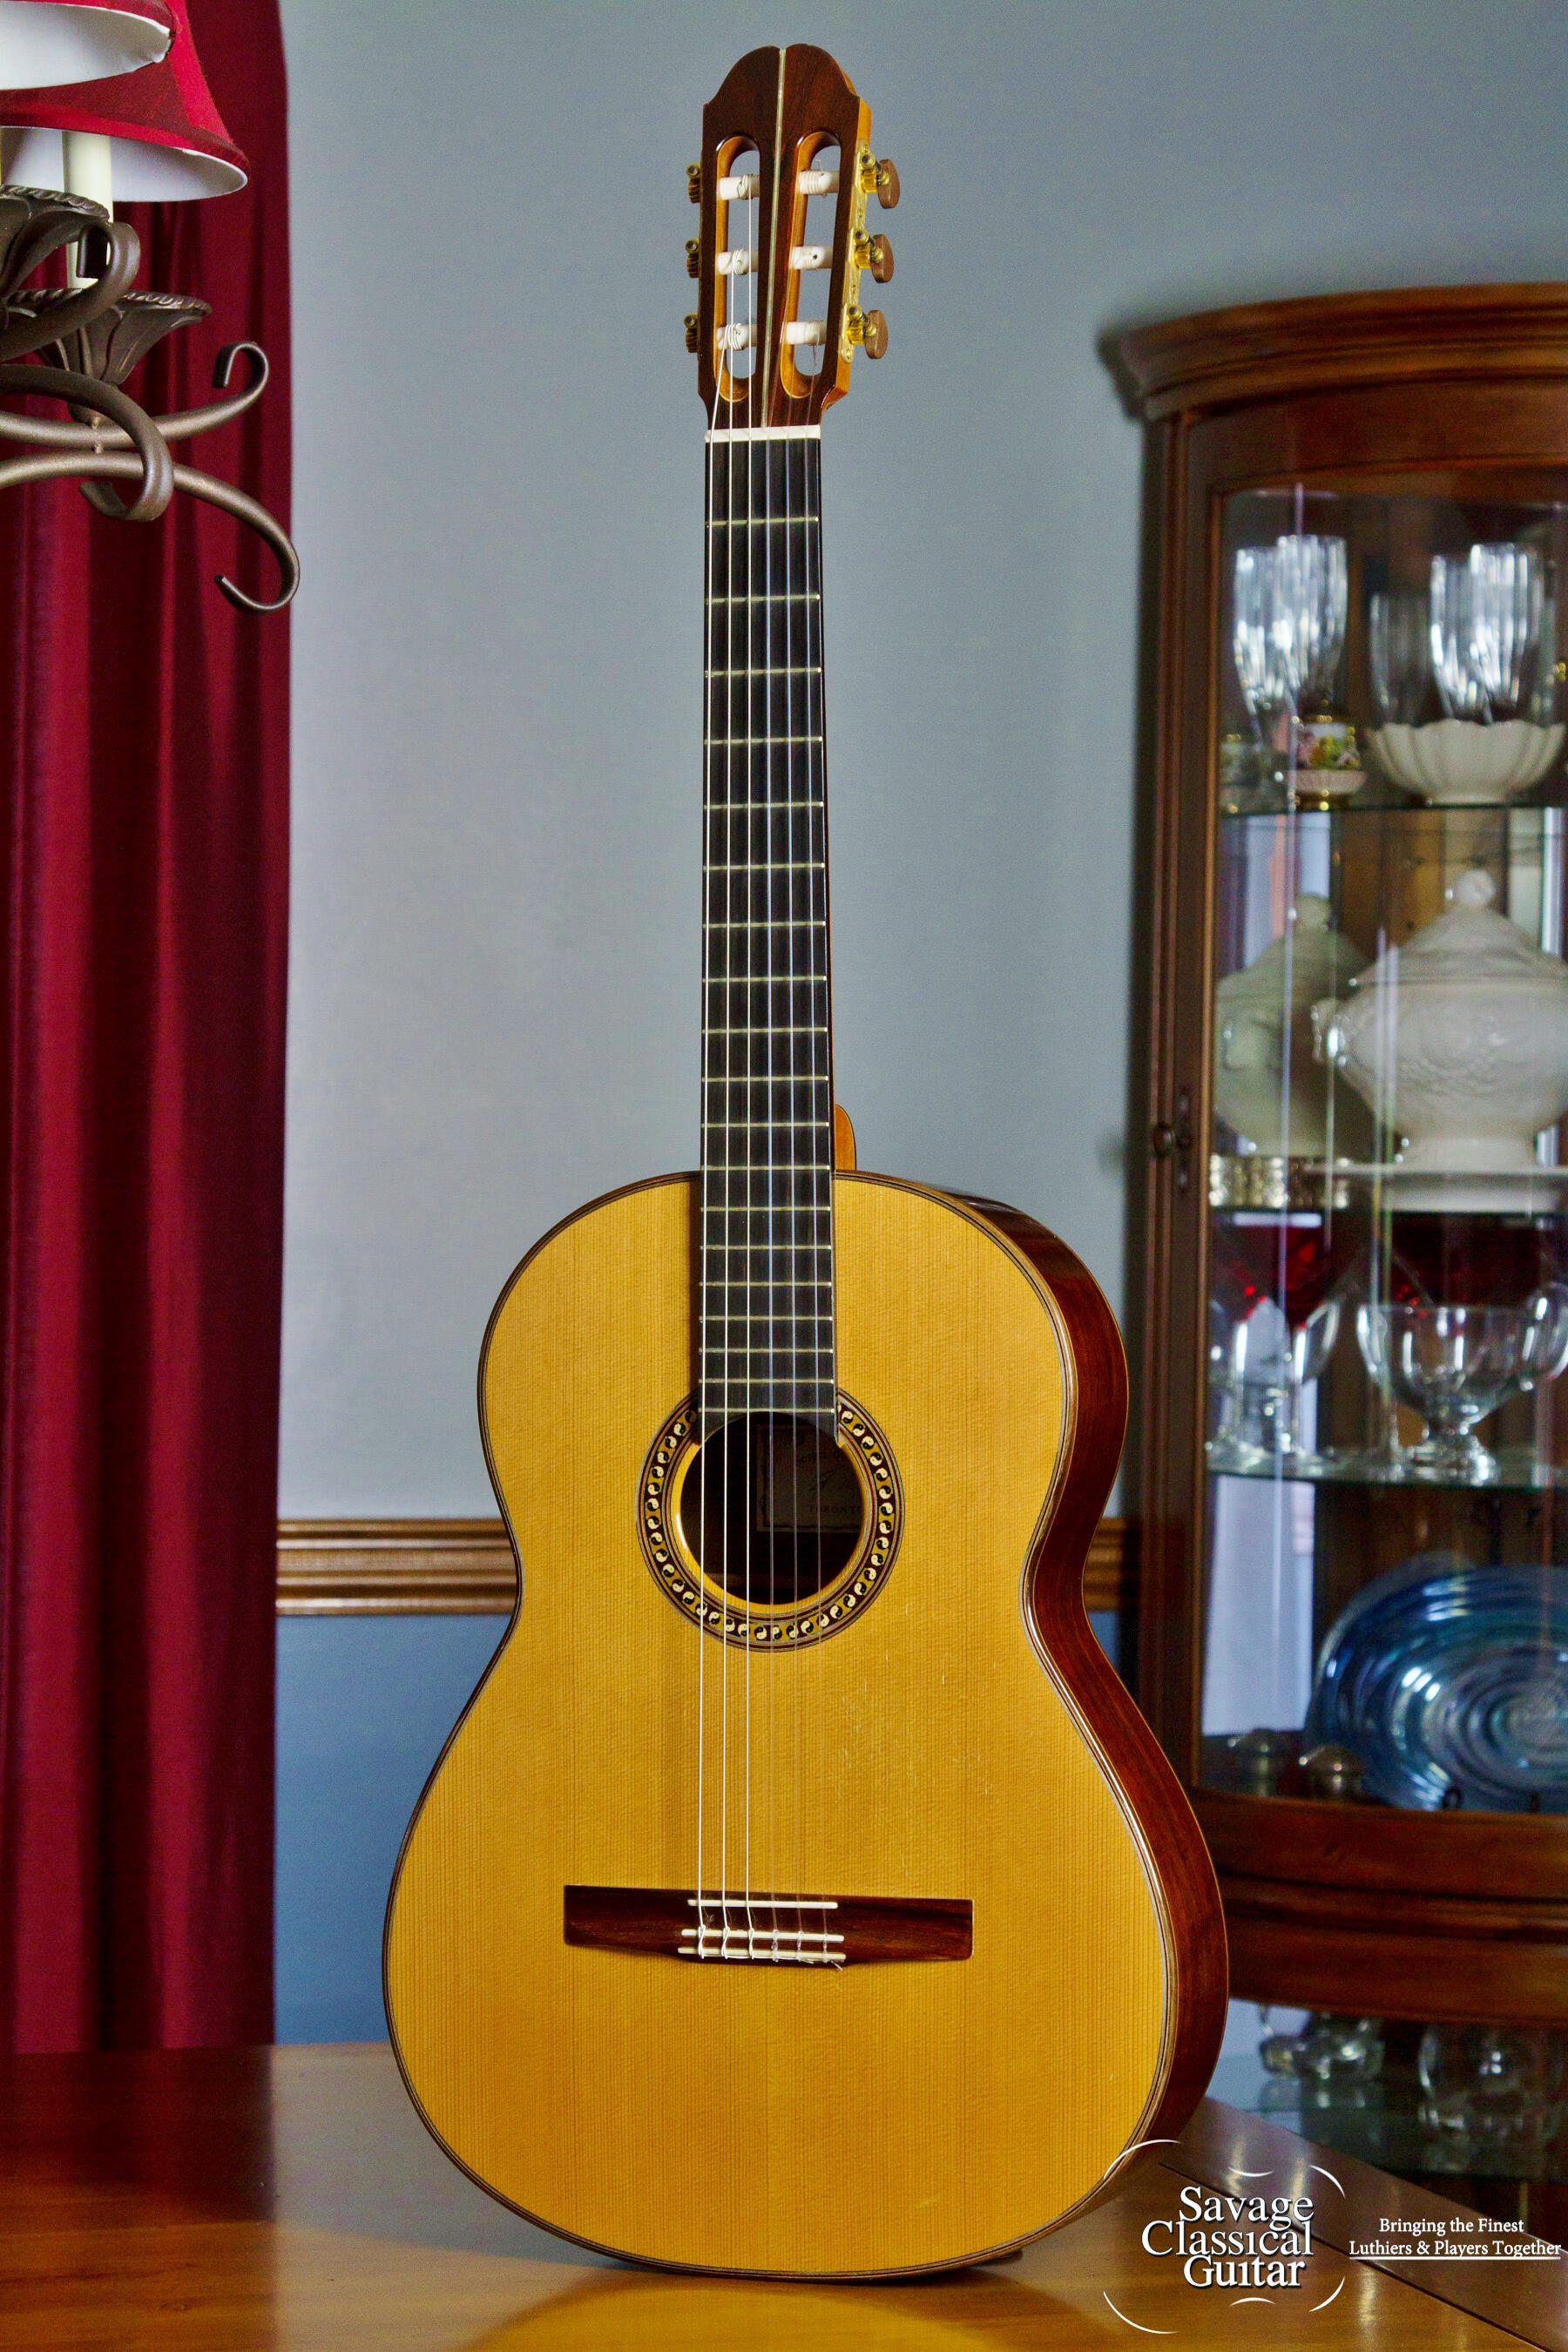 sergei de jonge classical guitar by savage classical guitar. Black Bedroom Furniture Sets. Home Design Ideas